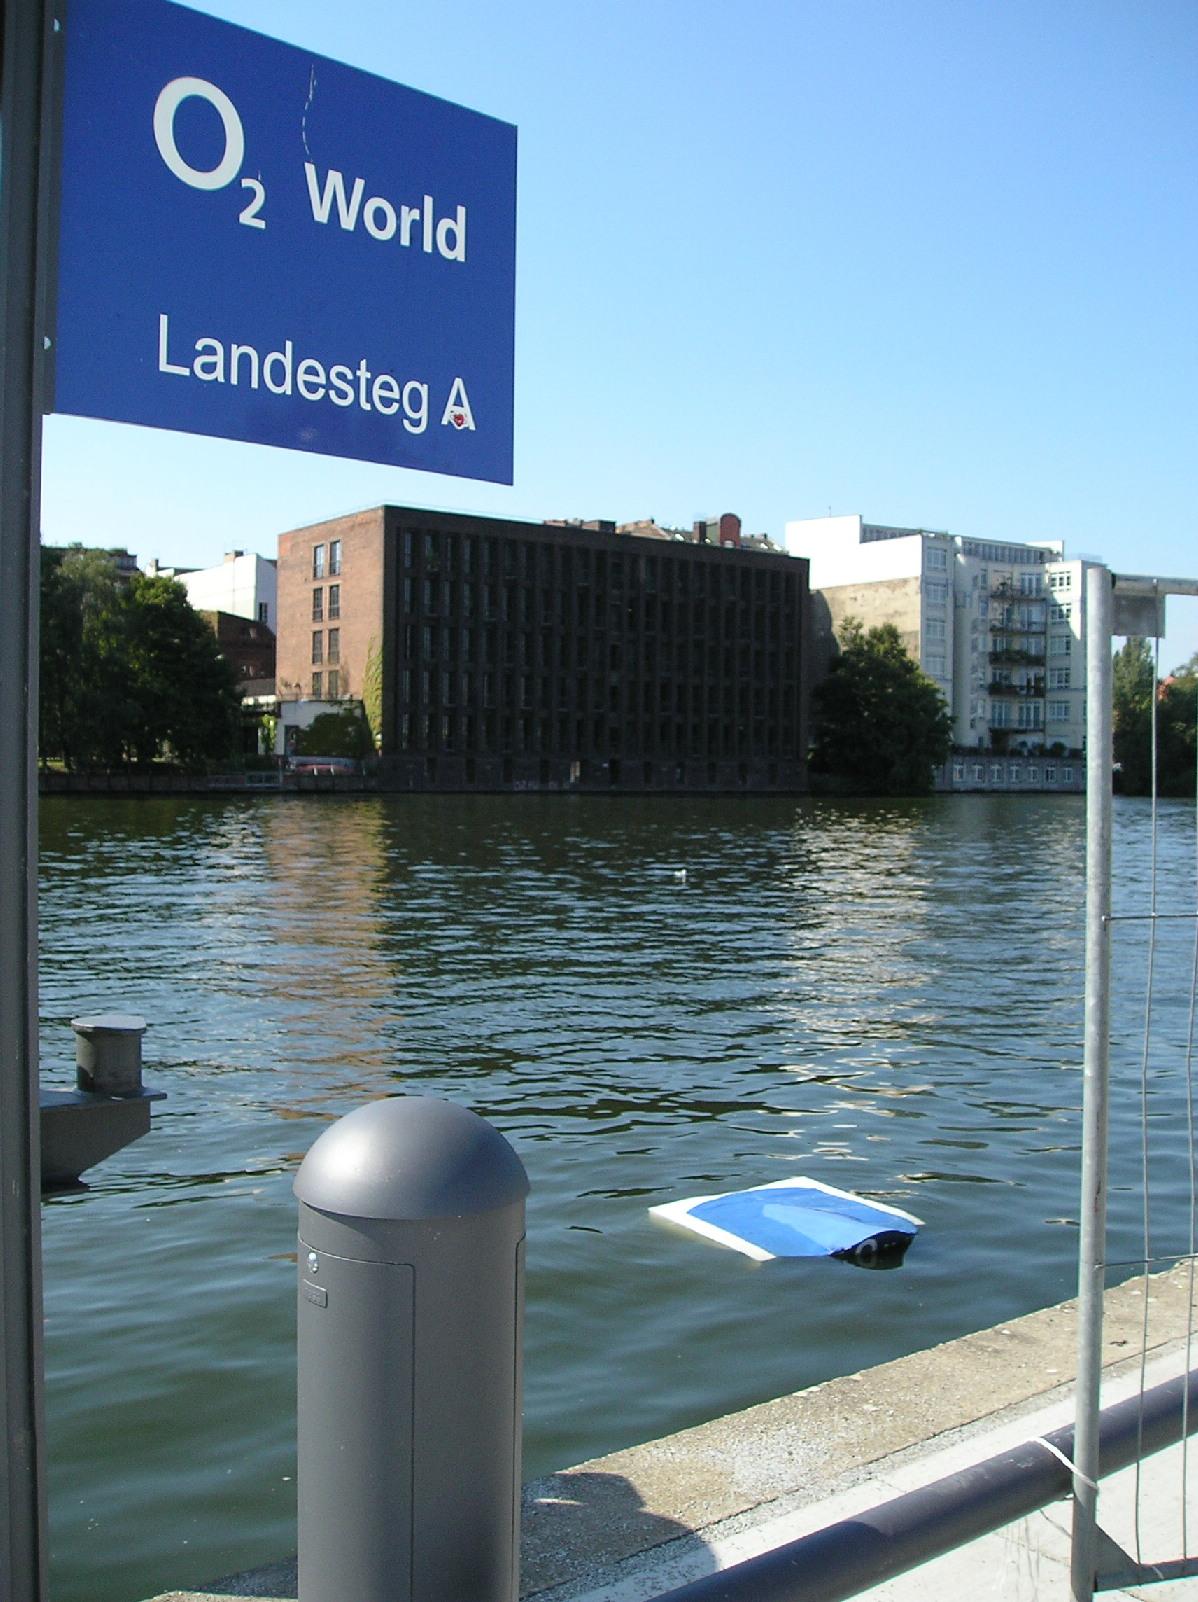 o2-world-landesteg